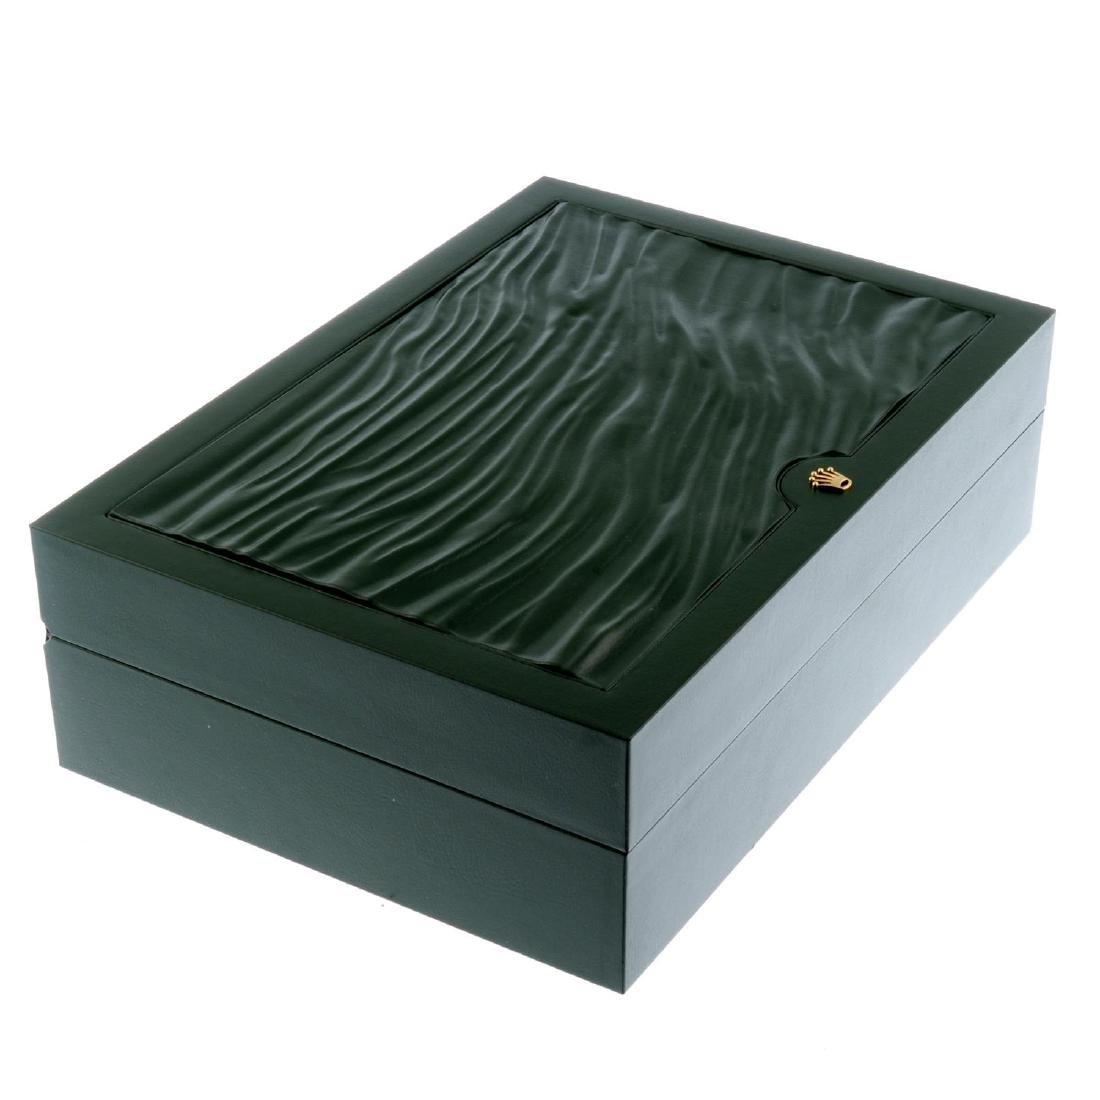 ROLEX - a complete watch box.